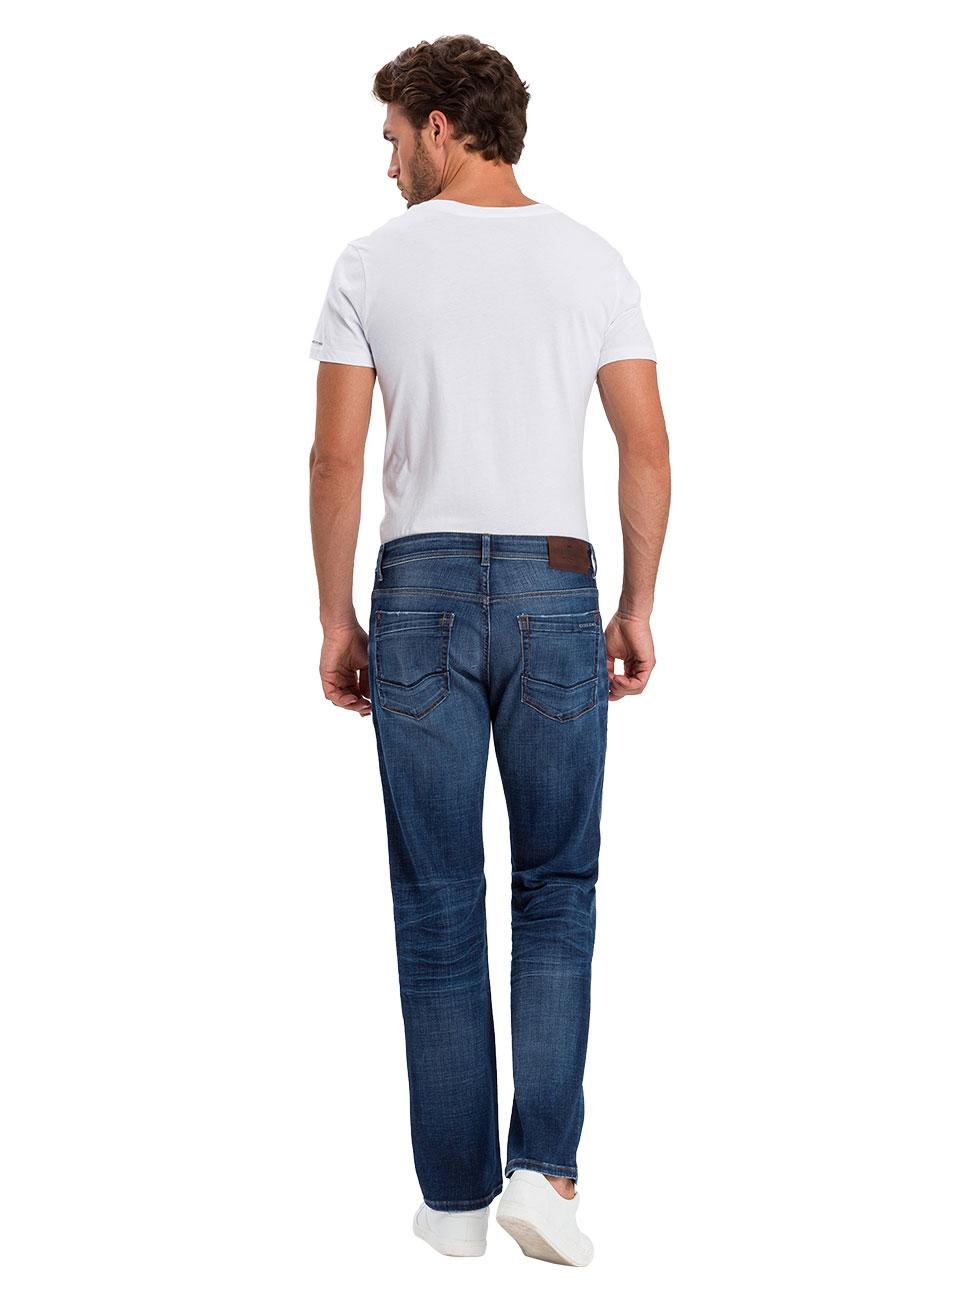 cross-jeans-herren-jeans-antonio-relax-fit-blau-dark-mid-blue